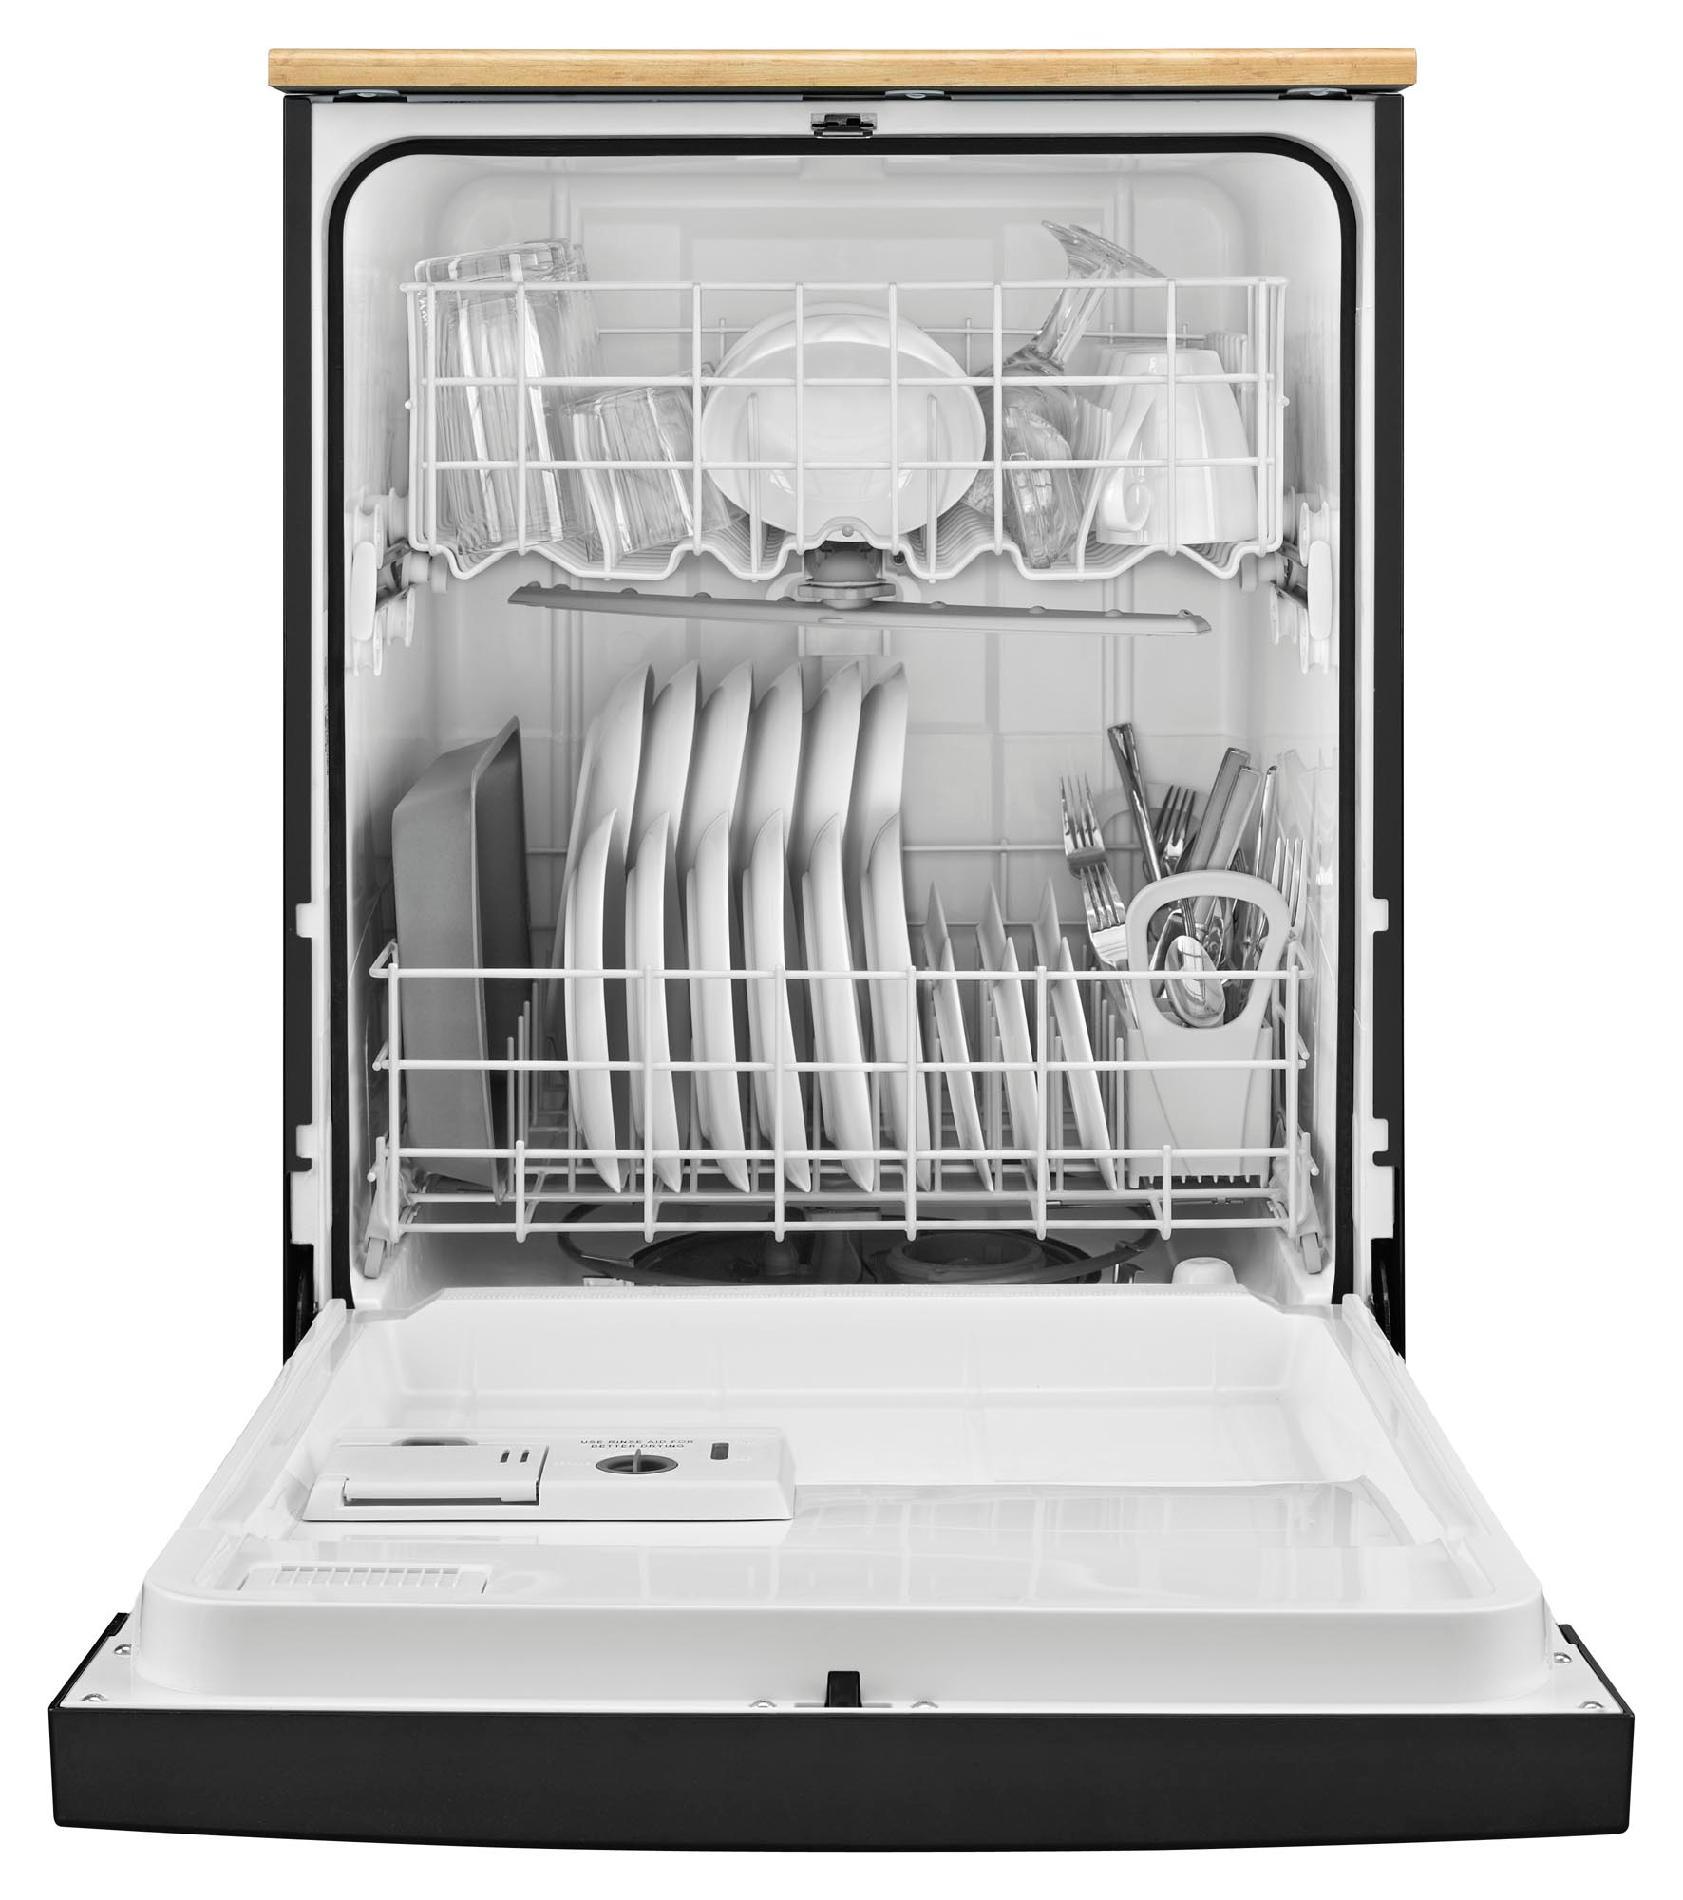 "Whirlpool WDP350PAAB 24"" Portable Dishwasher w/ 1-Hour Wash - Black"